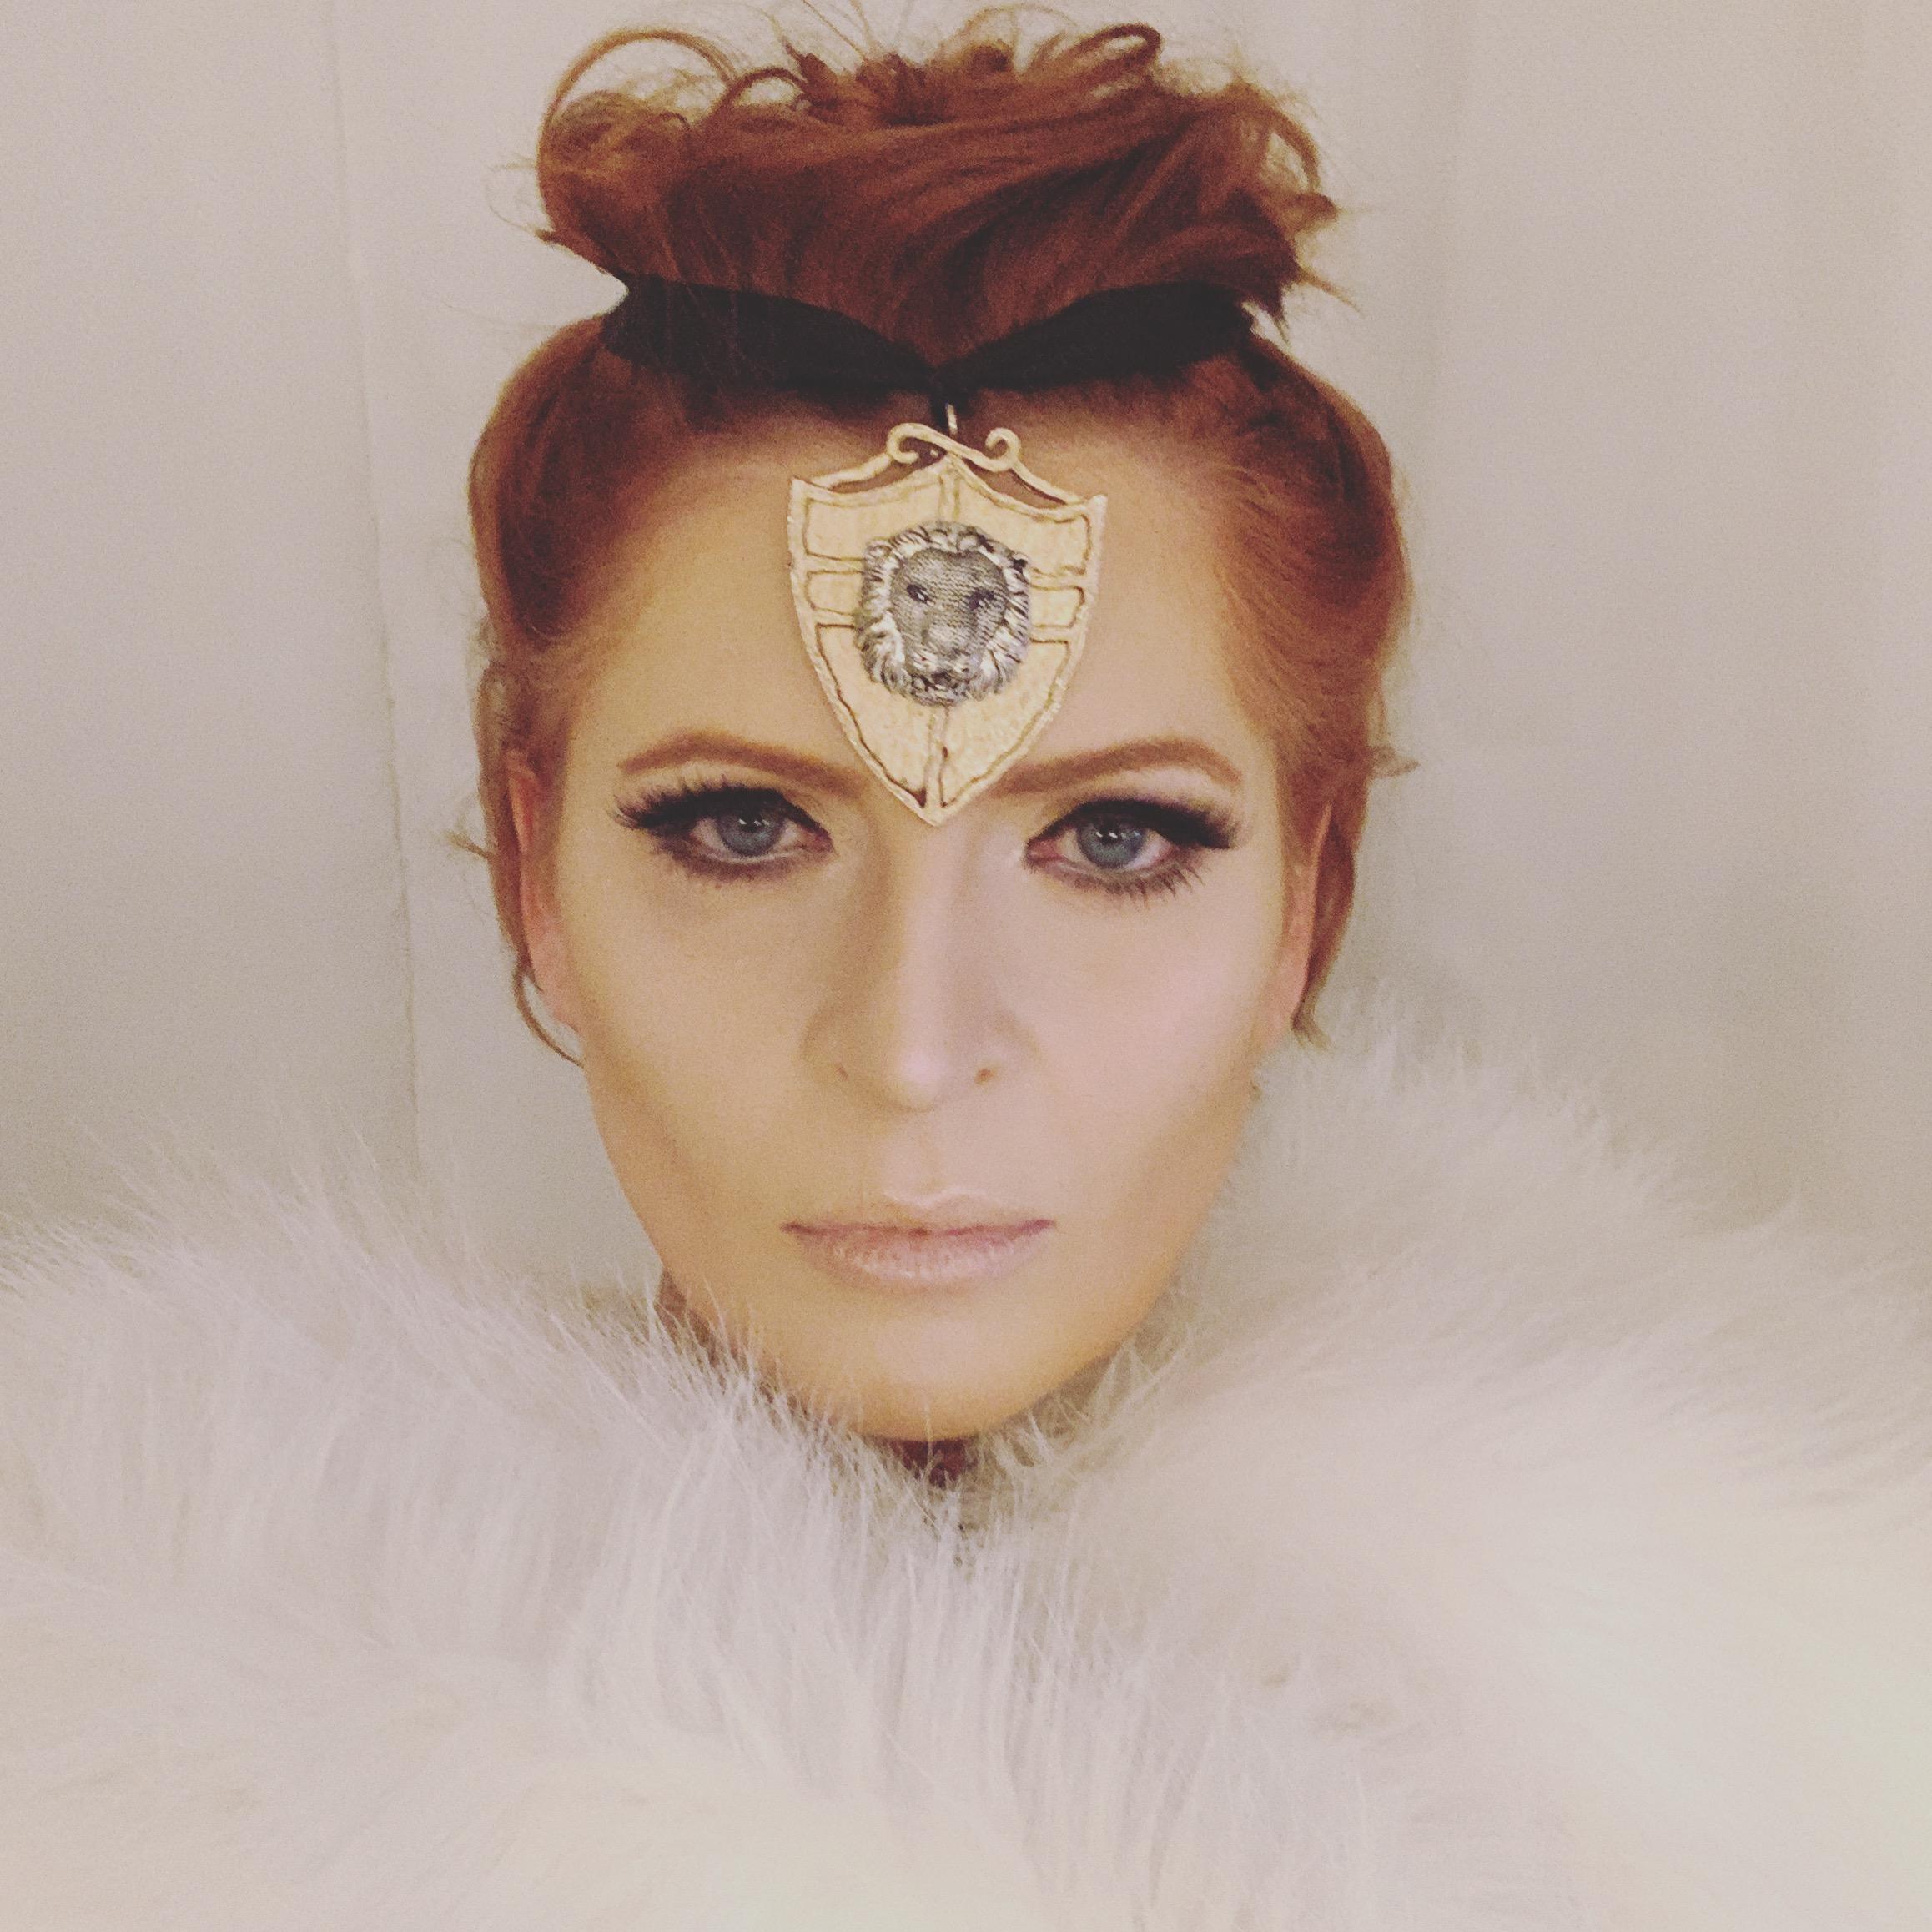 Lorna J Selfie